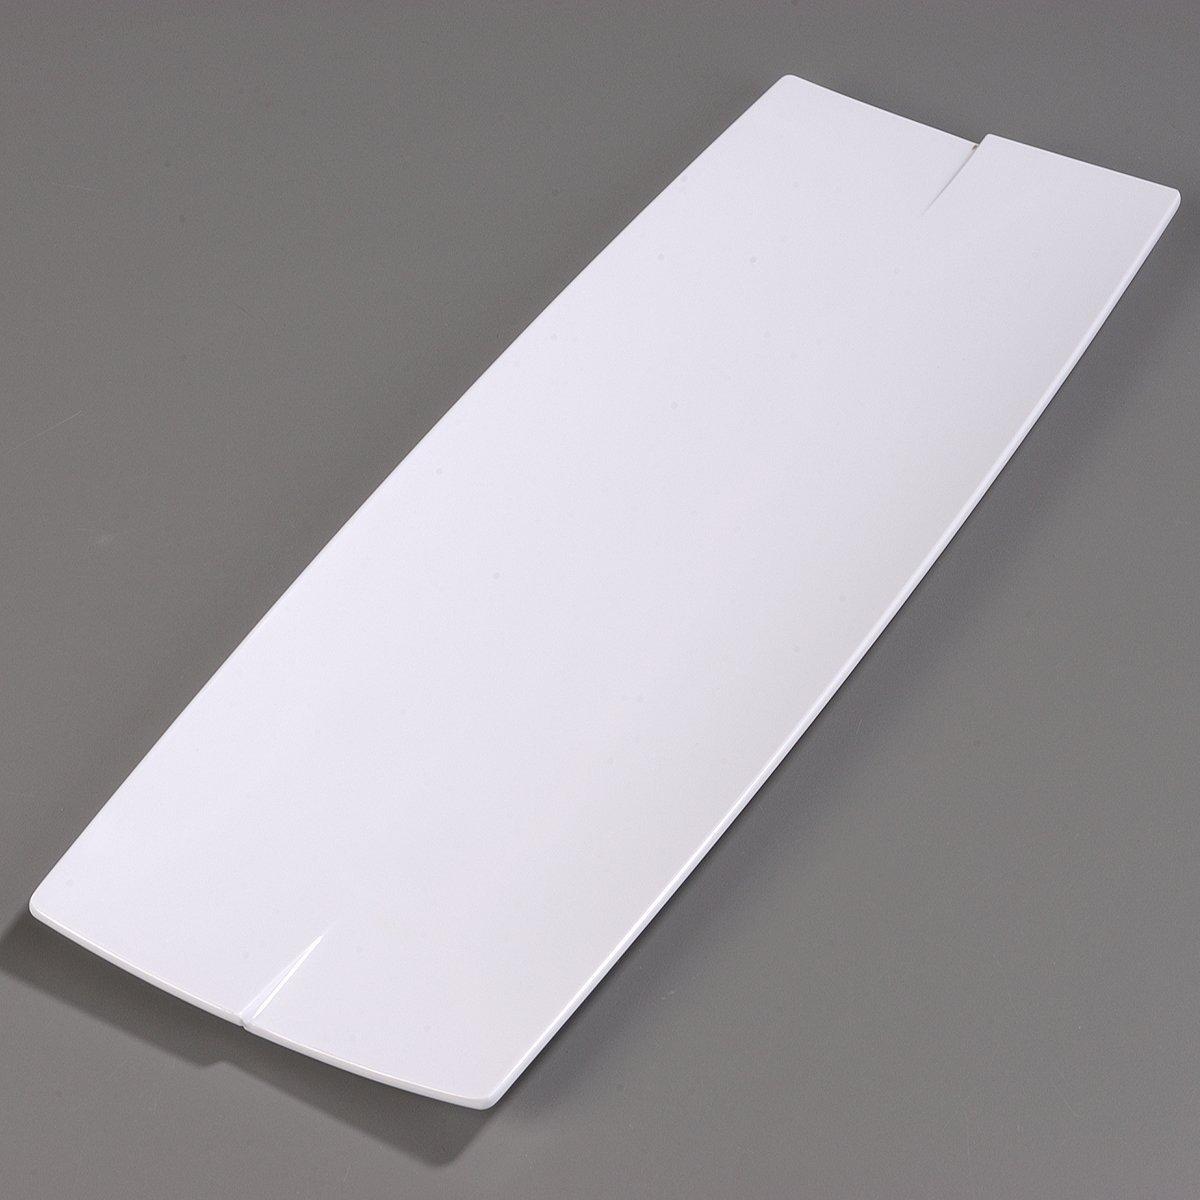 White 23 x 7.87 x 0.87 Carlisle 3332402 Rave Melamine Display Rectangular Platter Case of 6